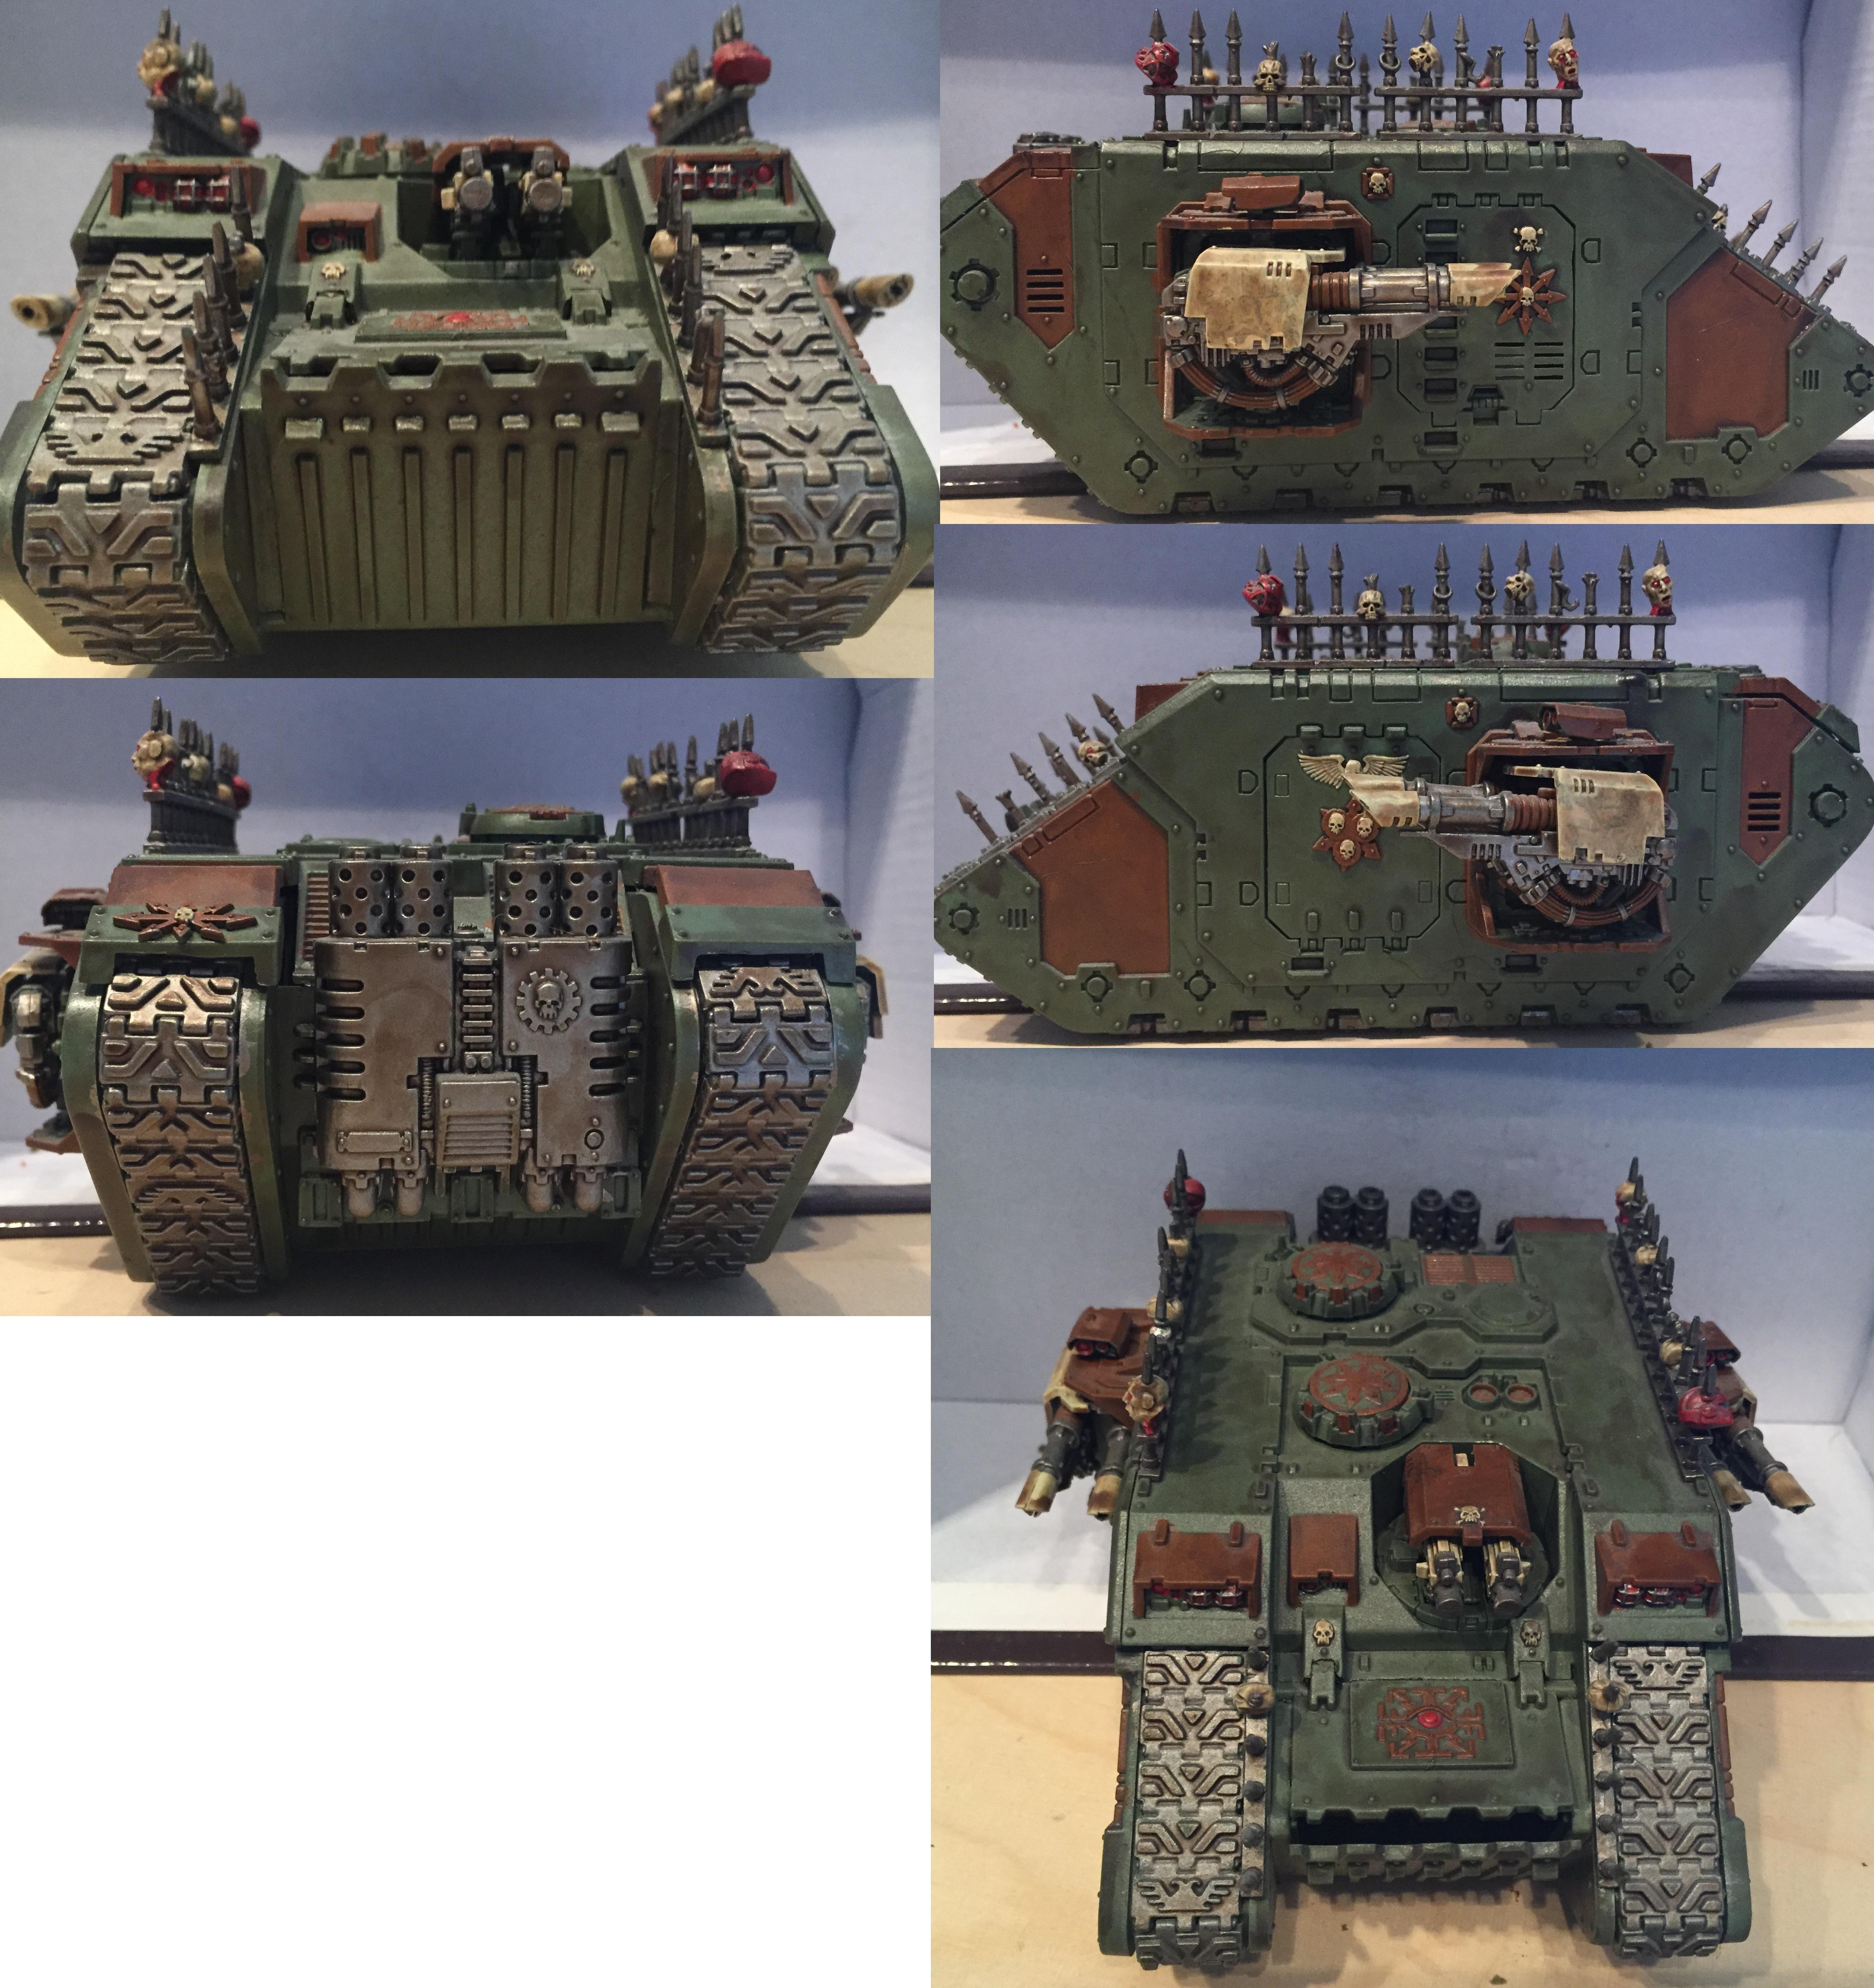 Chaos, Chaos Space Marines, Dipped, Land Raider, Nurgle, Petrifications, Tank, Warhammer 40,000